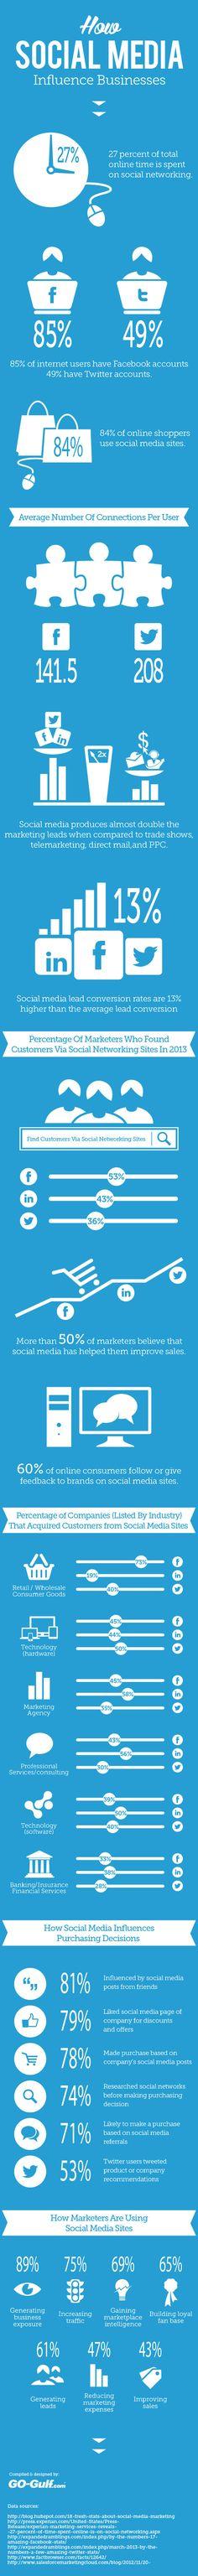 How Social Media Influence Businesses [INFOGRAPHIC] #businesses#socialmedia